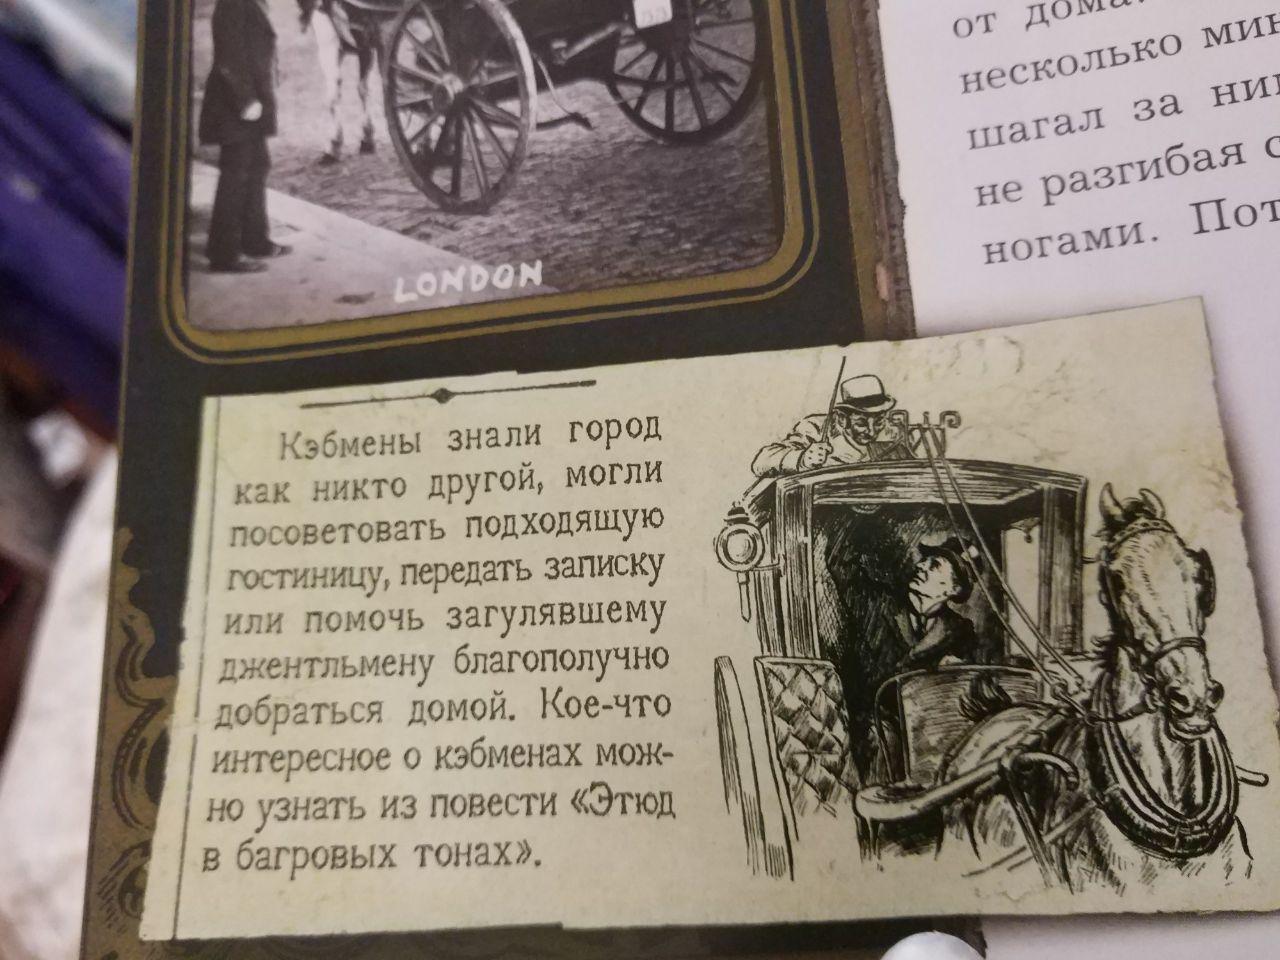 http://s5.uploads.ru/cT6Wj.jpg